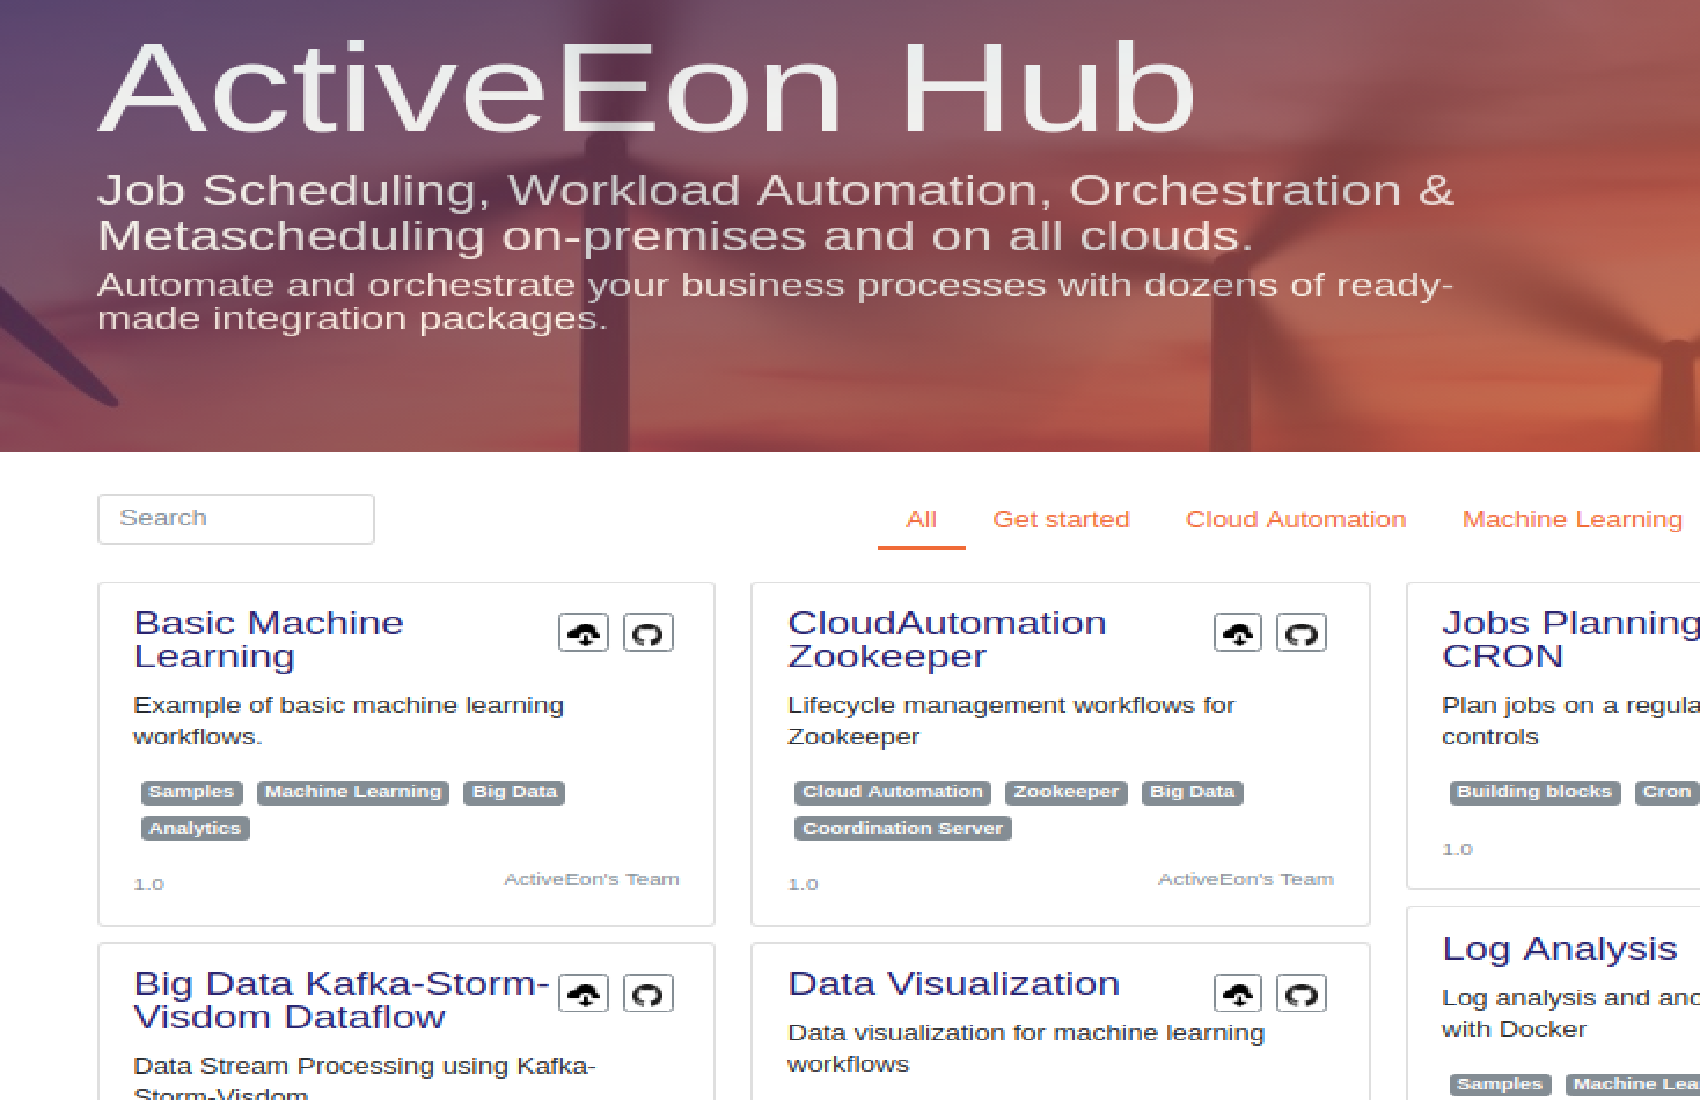 images/product-screenshots/screenshot-hub.png